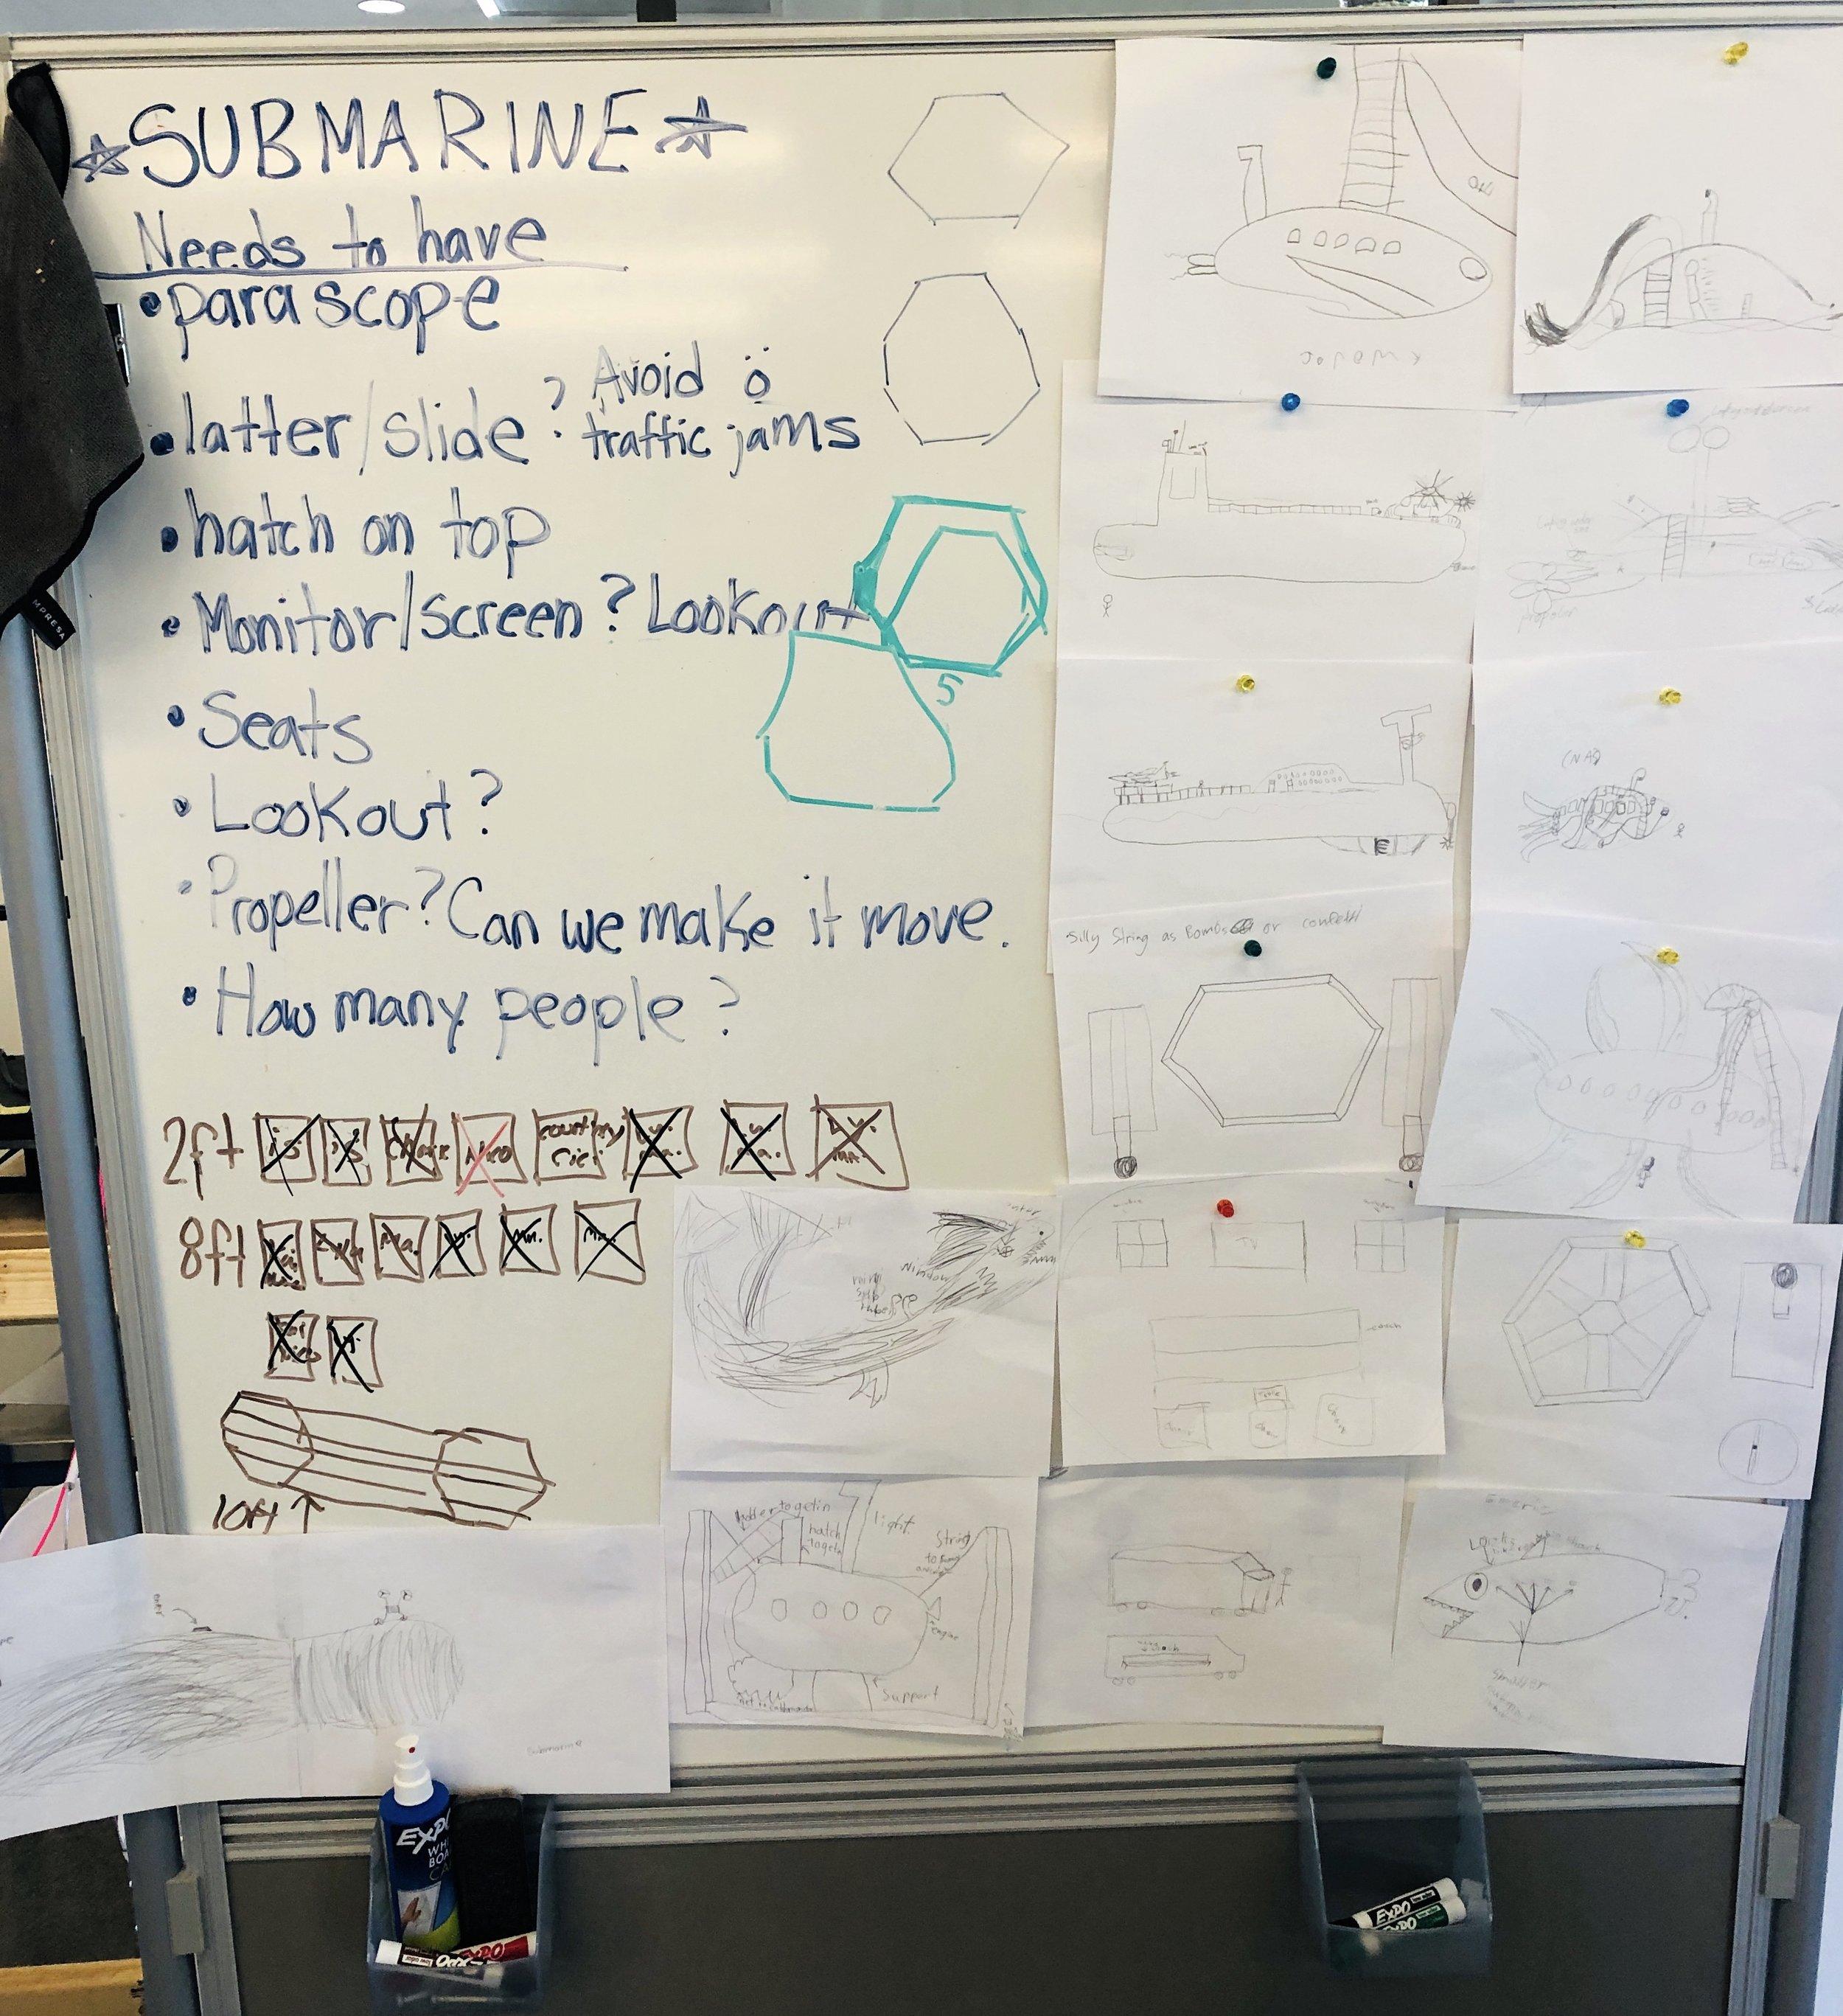 submarine planning board.jpg